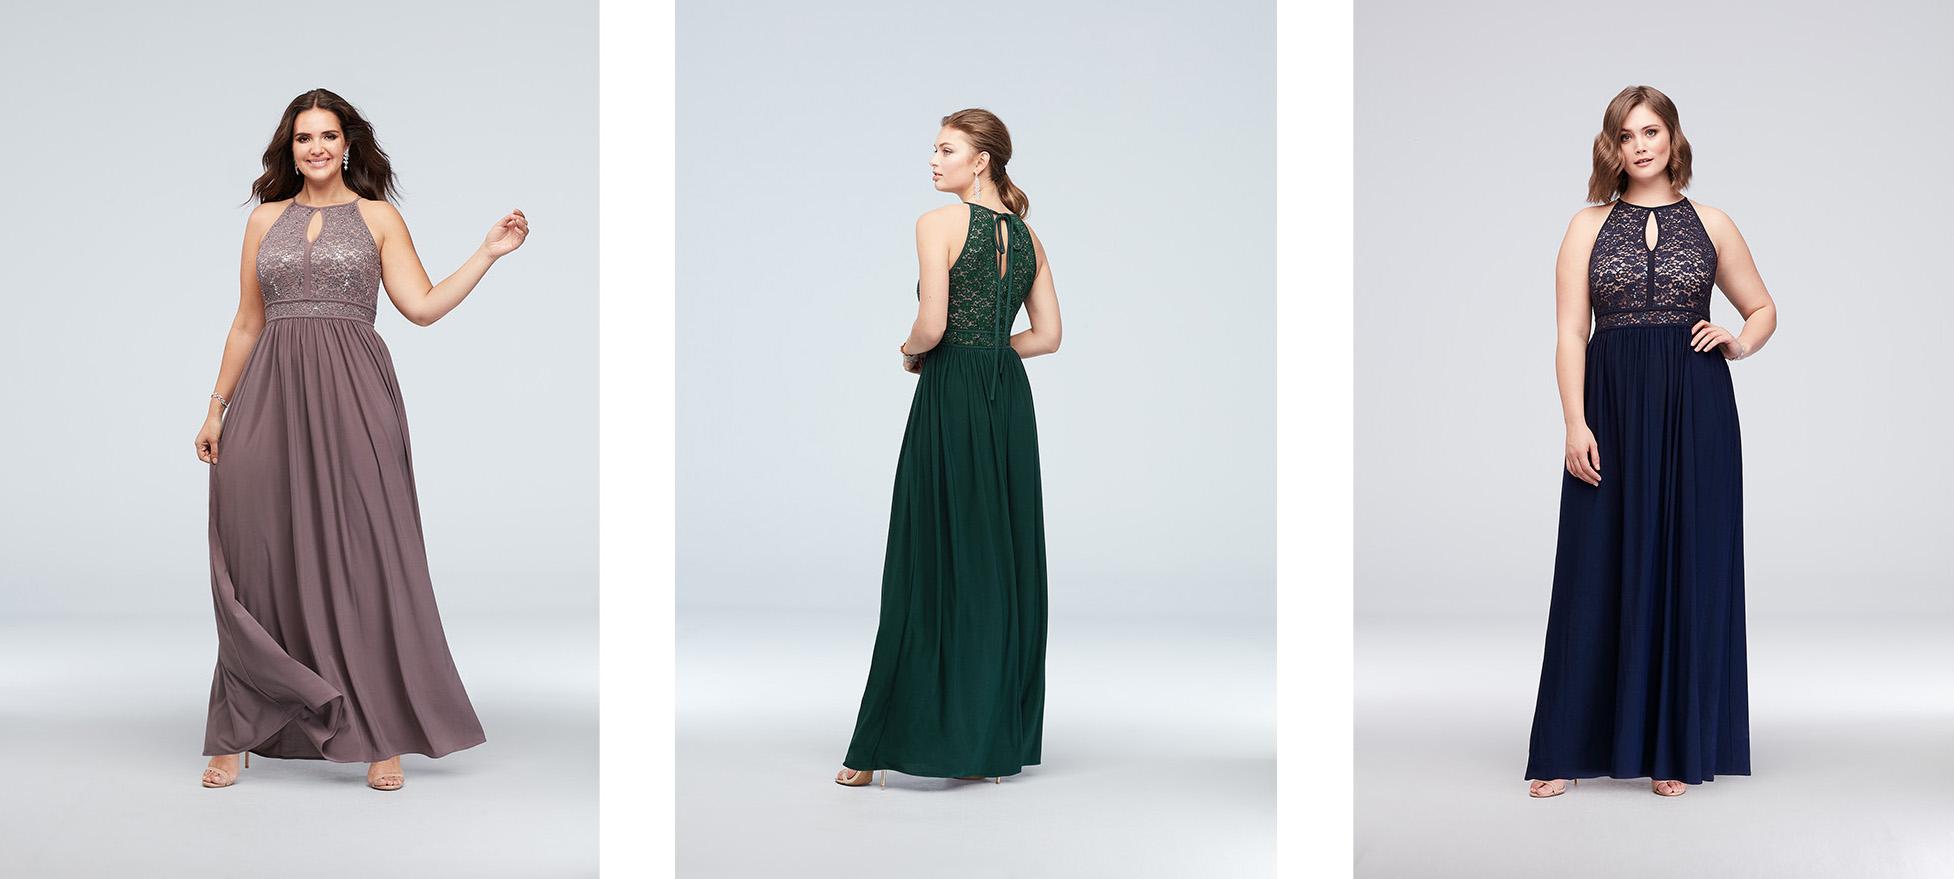 Three high-neck occasion dresses